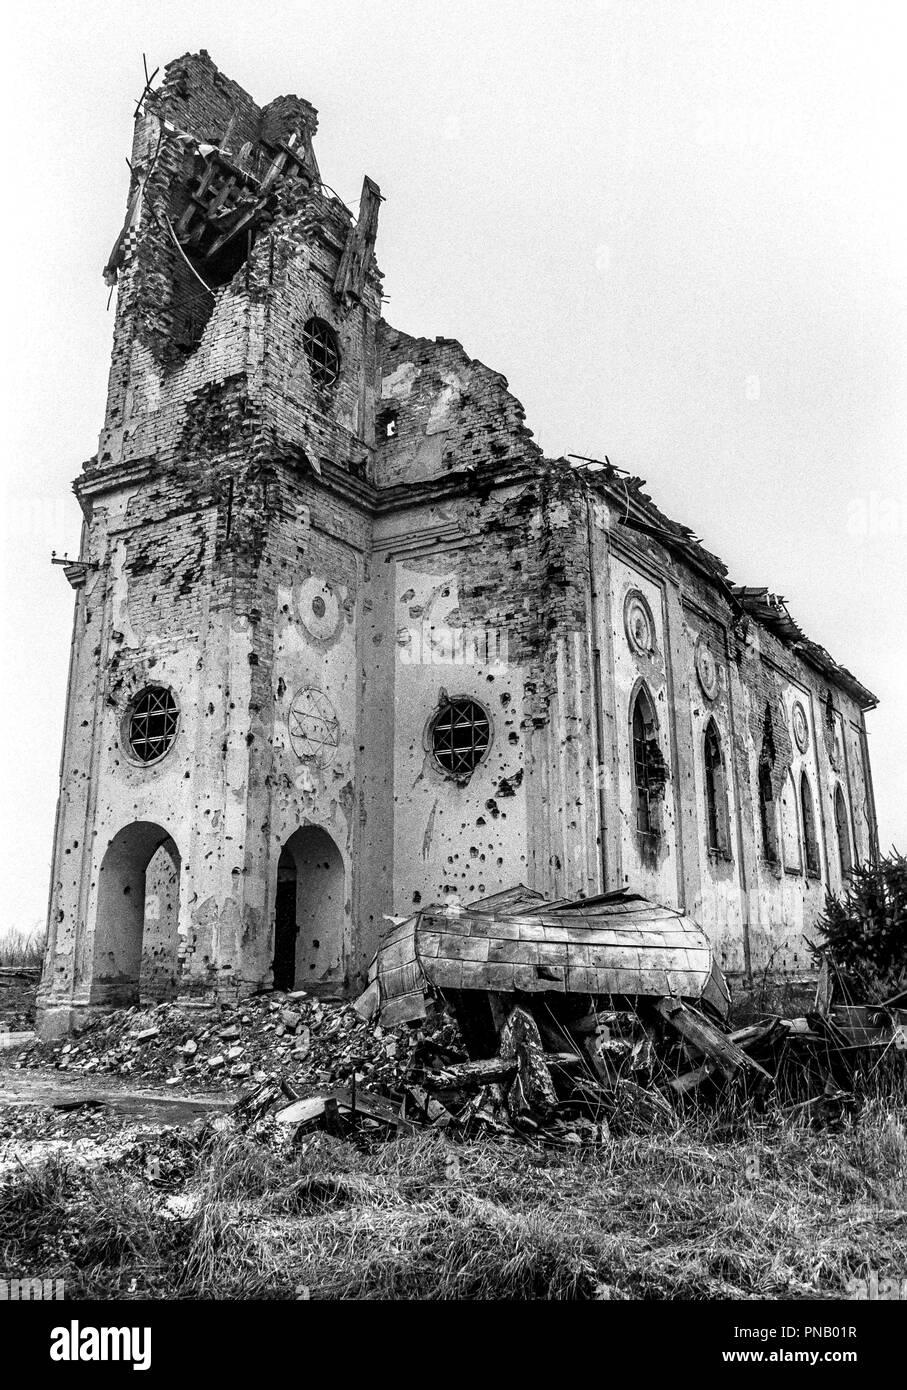 Hungarian Reformed Church, Laslovo/Szentlászló, Croatia. Built in 1878, destroyed in October 1991. Stock Photo